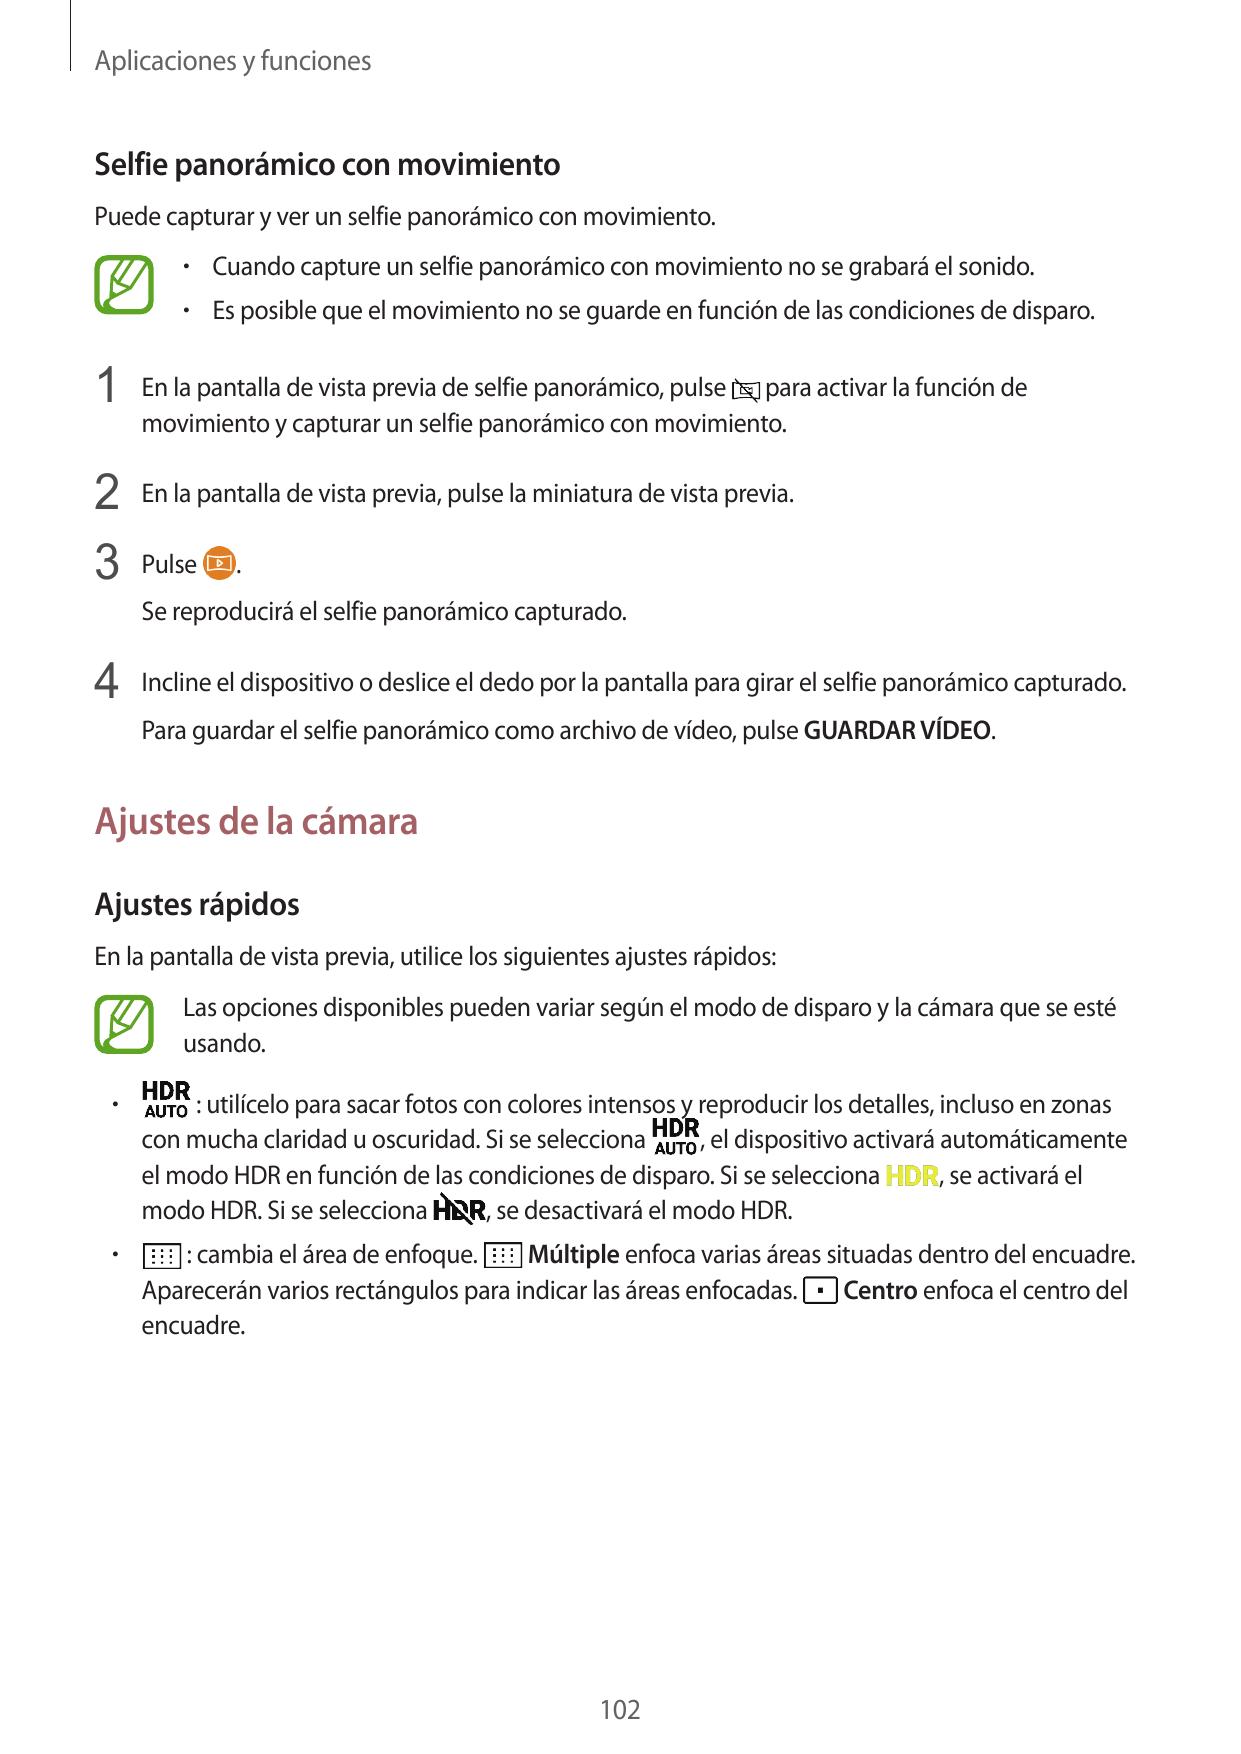 Manual - Samsung Galaxy S8 - Android 7.0 - Guías Smart